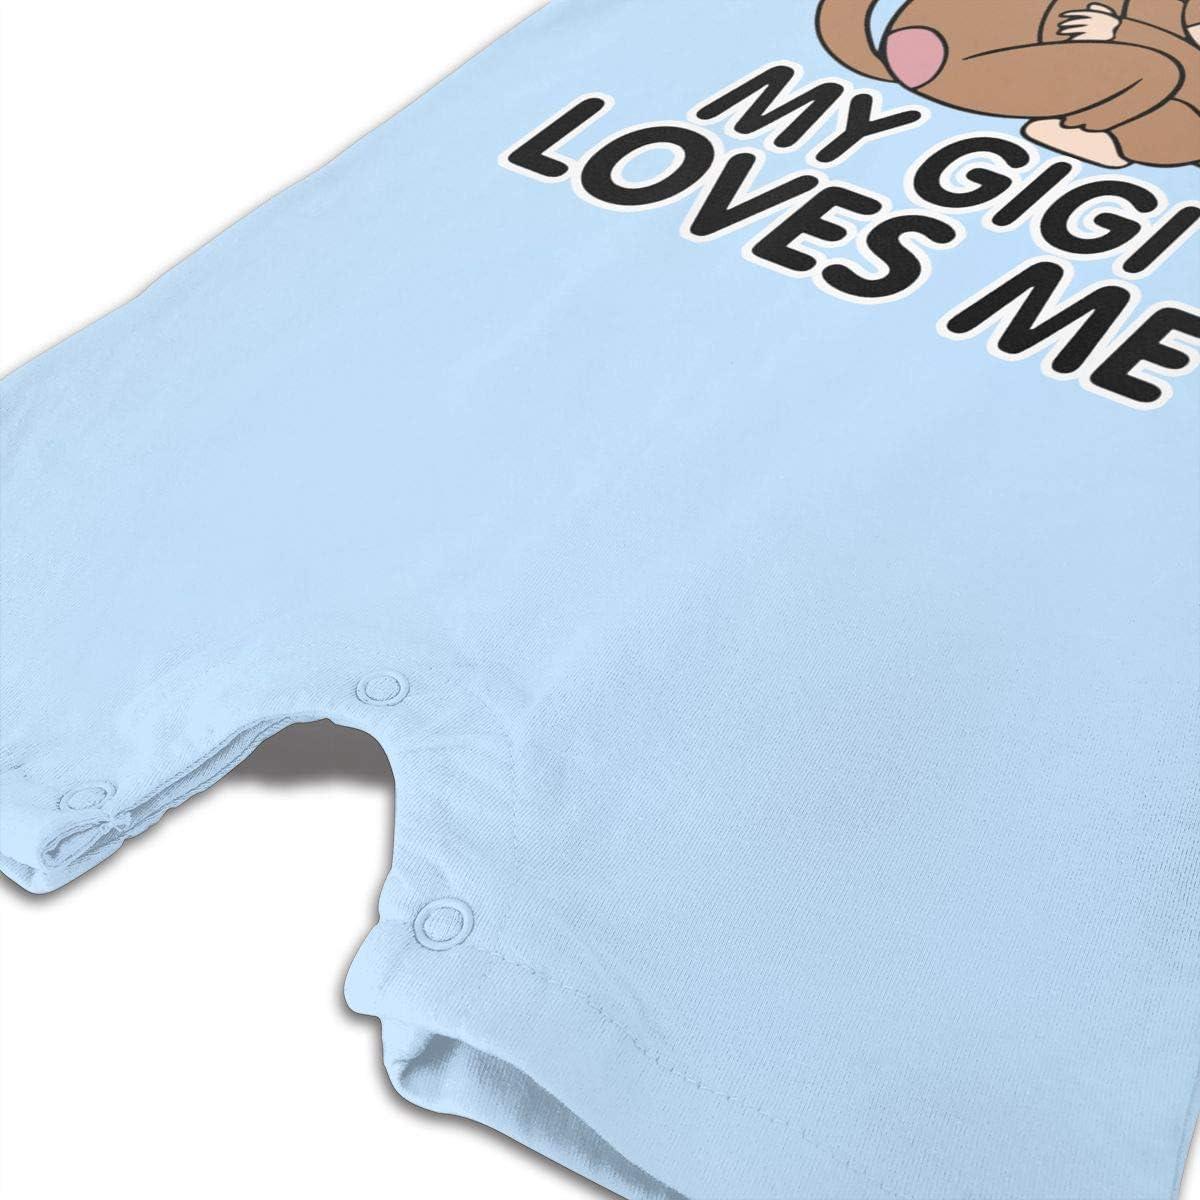 Monkey Gigi Loves Me Baby Bodysuit Playwear Comfortable Short Sleeve Jumpsuit Bath Gift